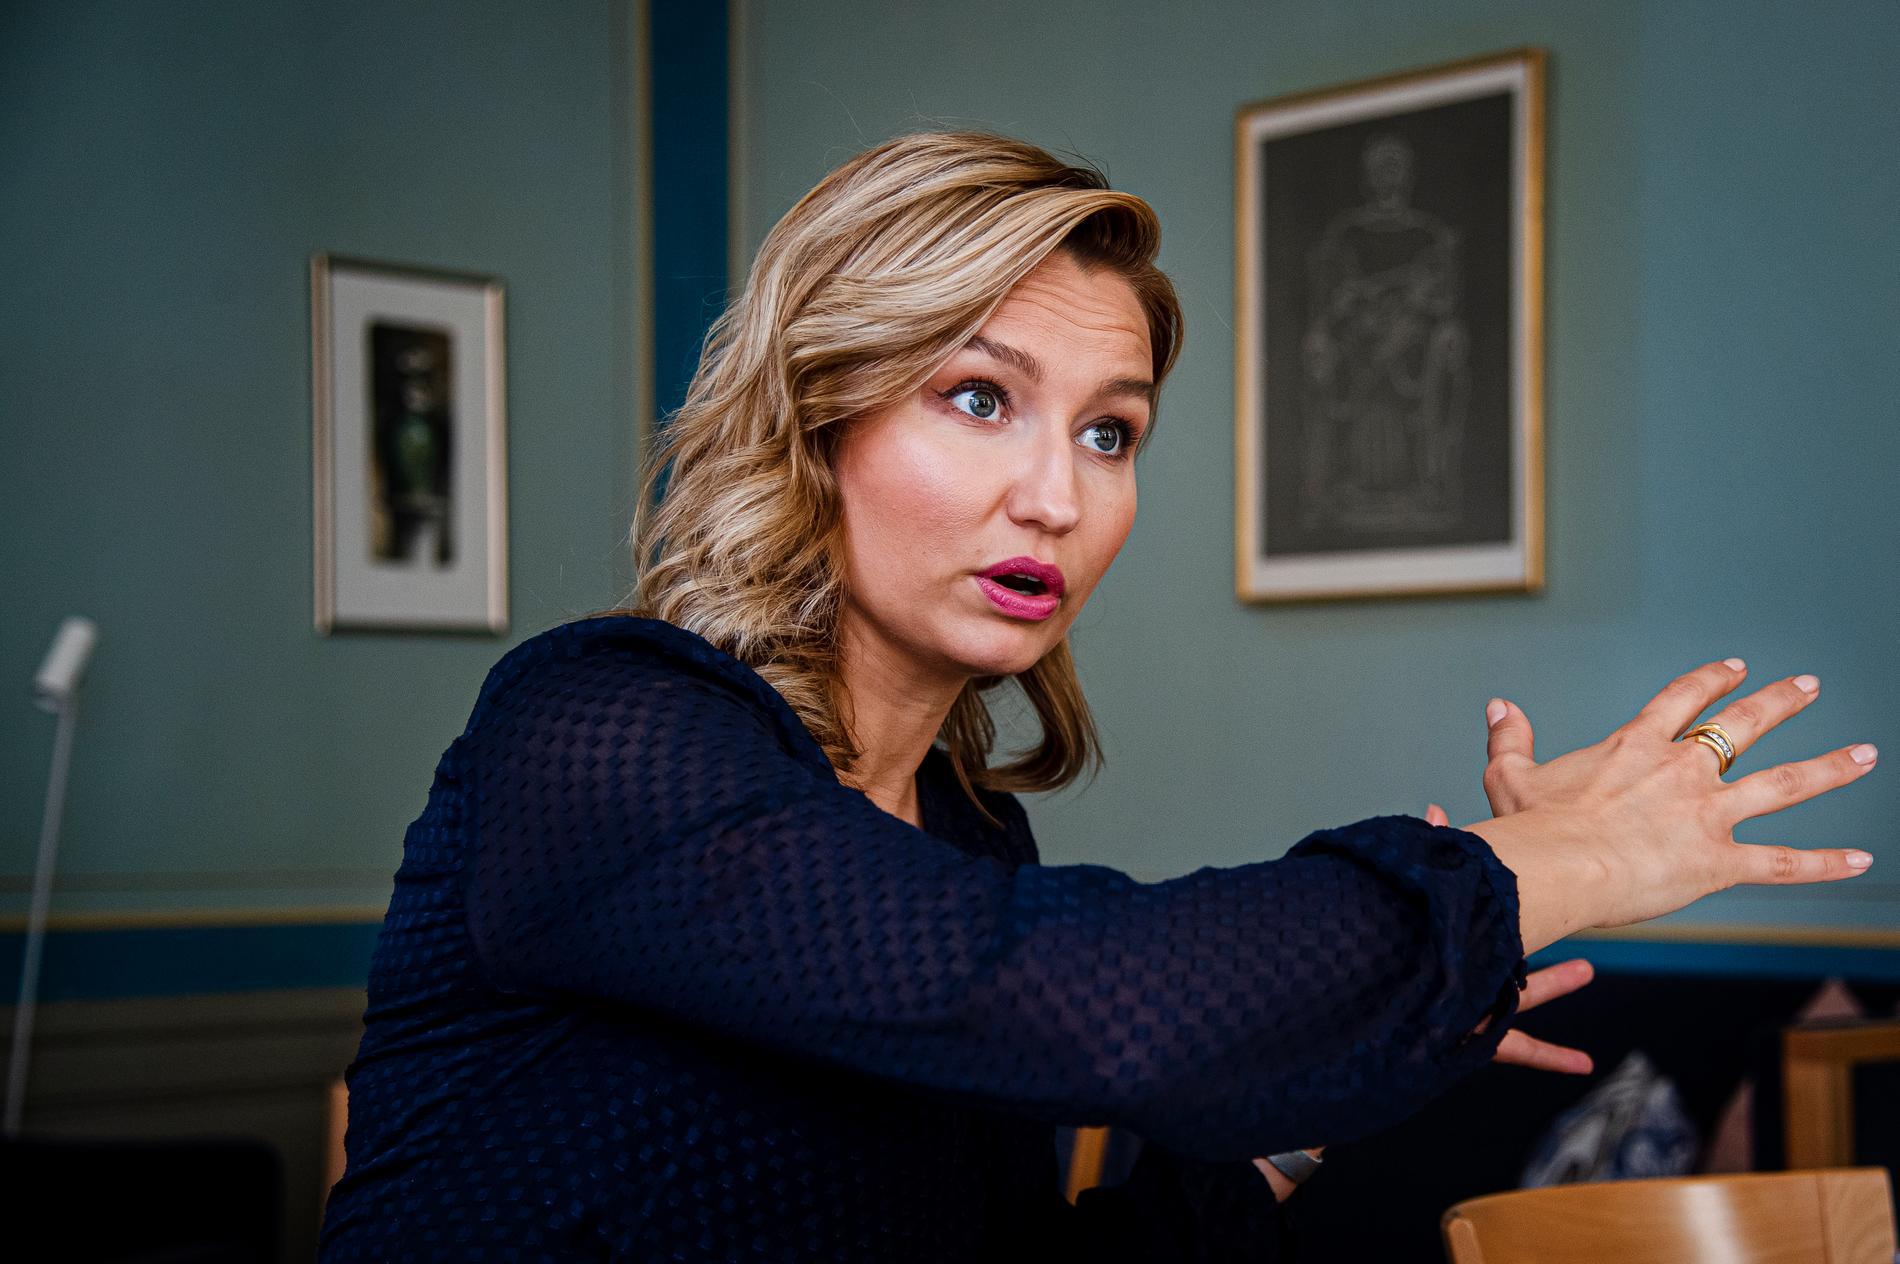 """Ebba Busch framstår i allt tydligare dager som en sällsynt elak liten fan"", skriver Jan Guillou."